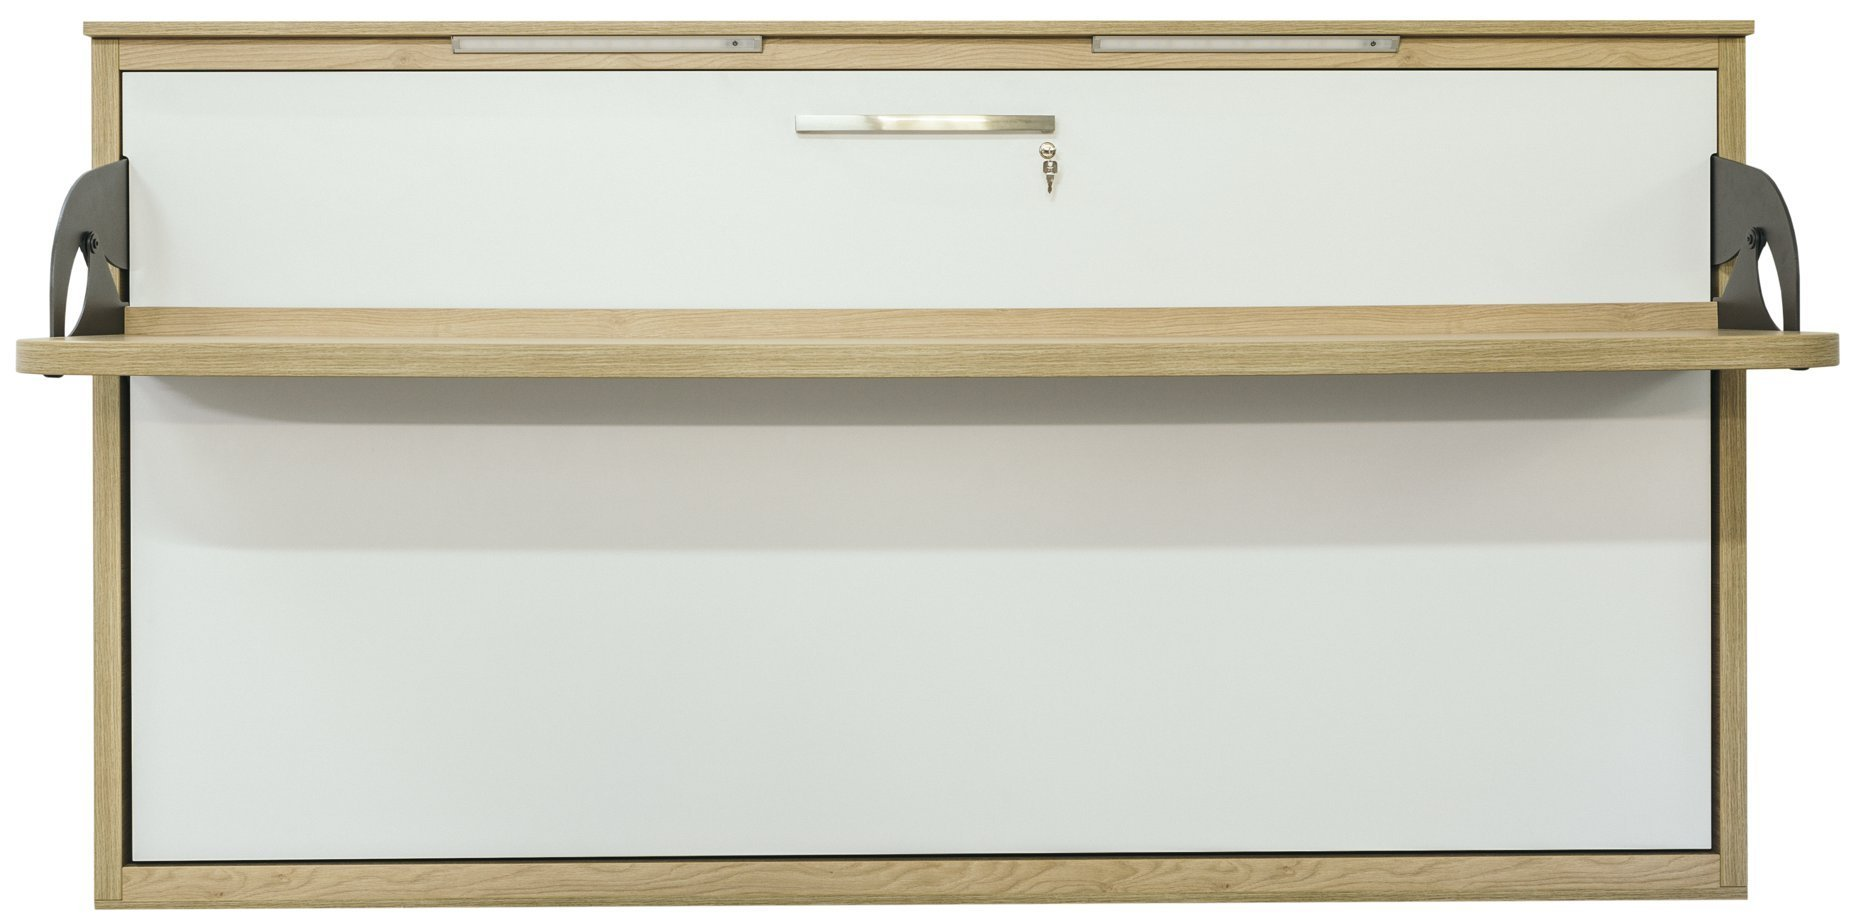 Quer Wandbett Schrankbett Singlo Desk 90 x 200 cm, in Weiß-Buche